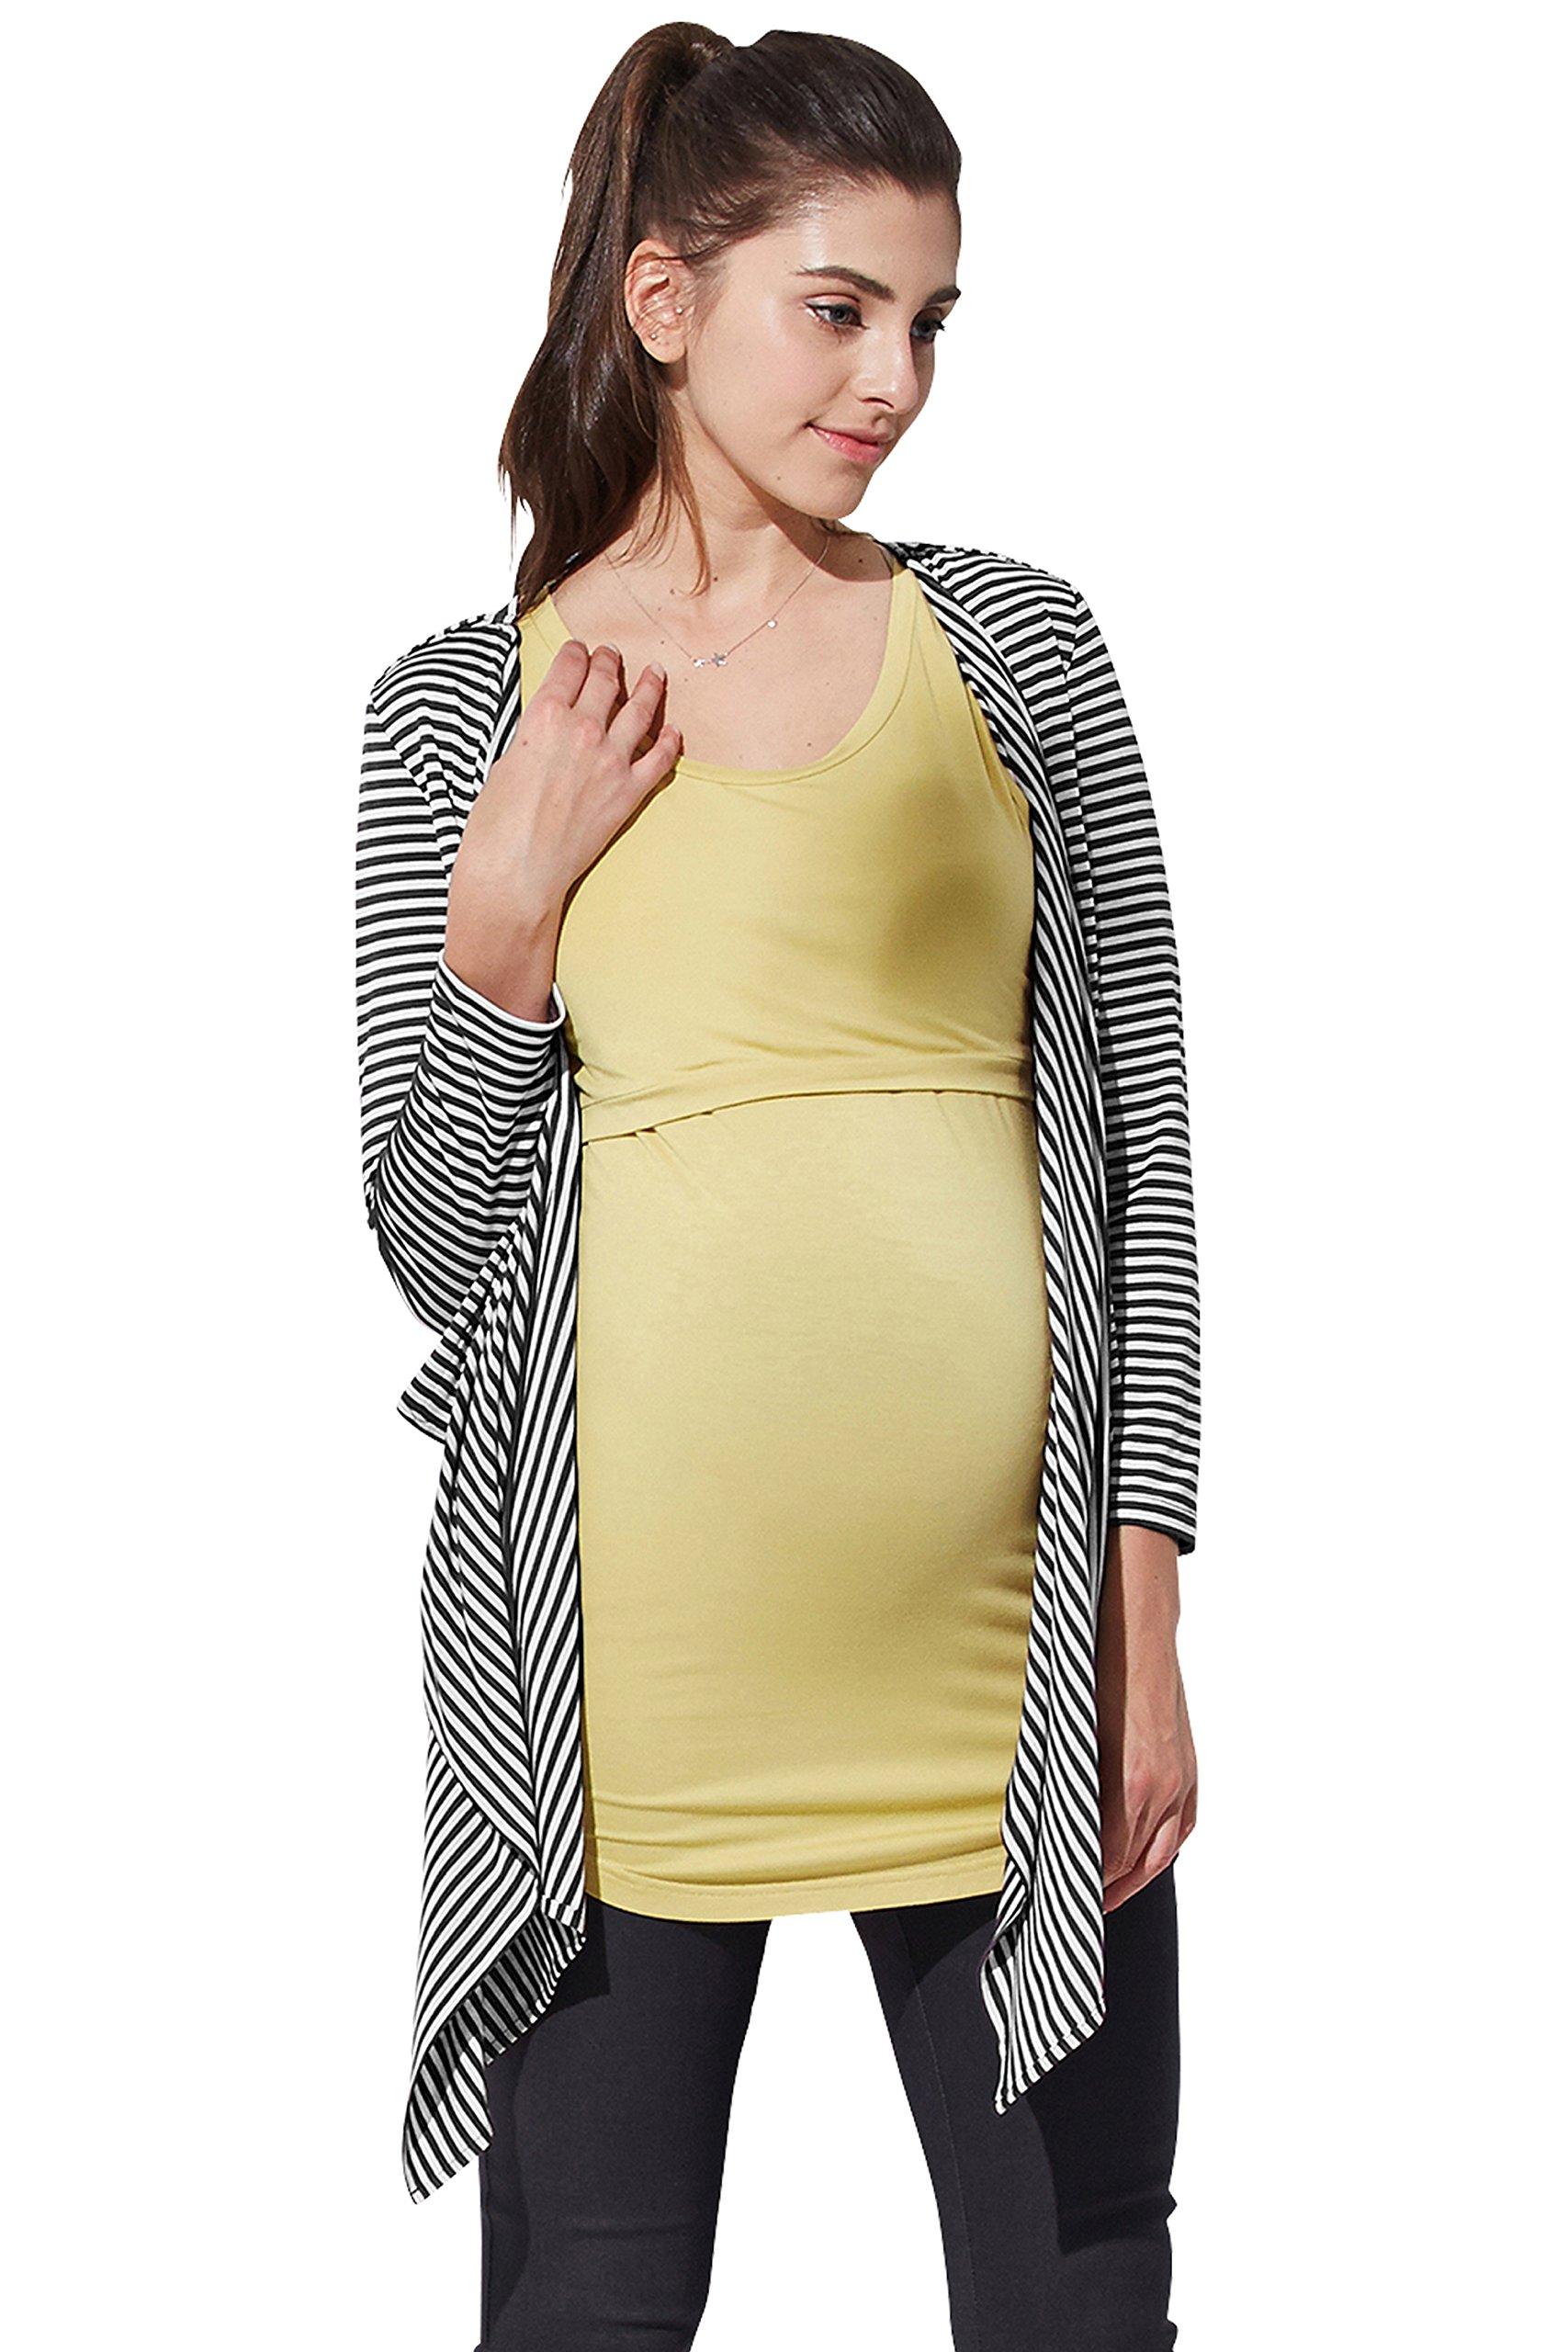 Sweet Mommy Nursing Cover Striped Drape Cardigan Blackwhite, M